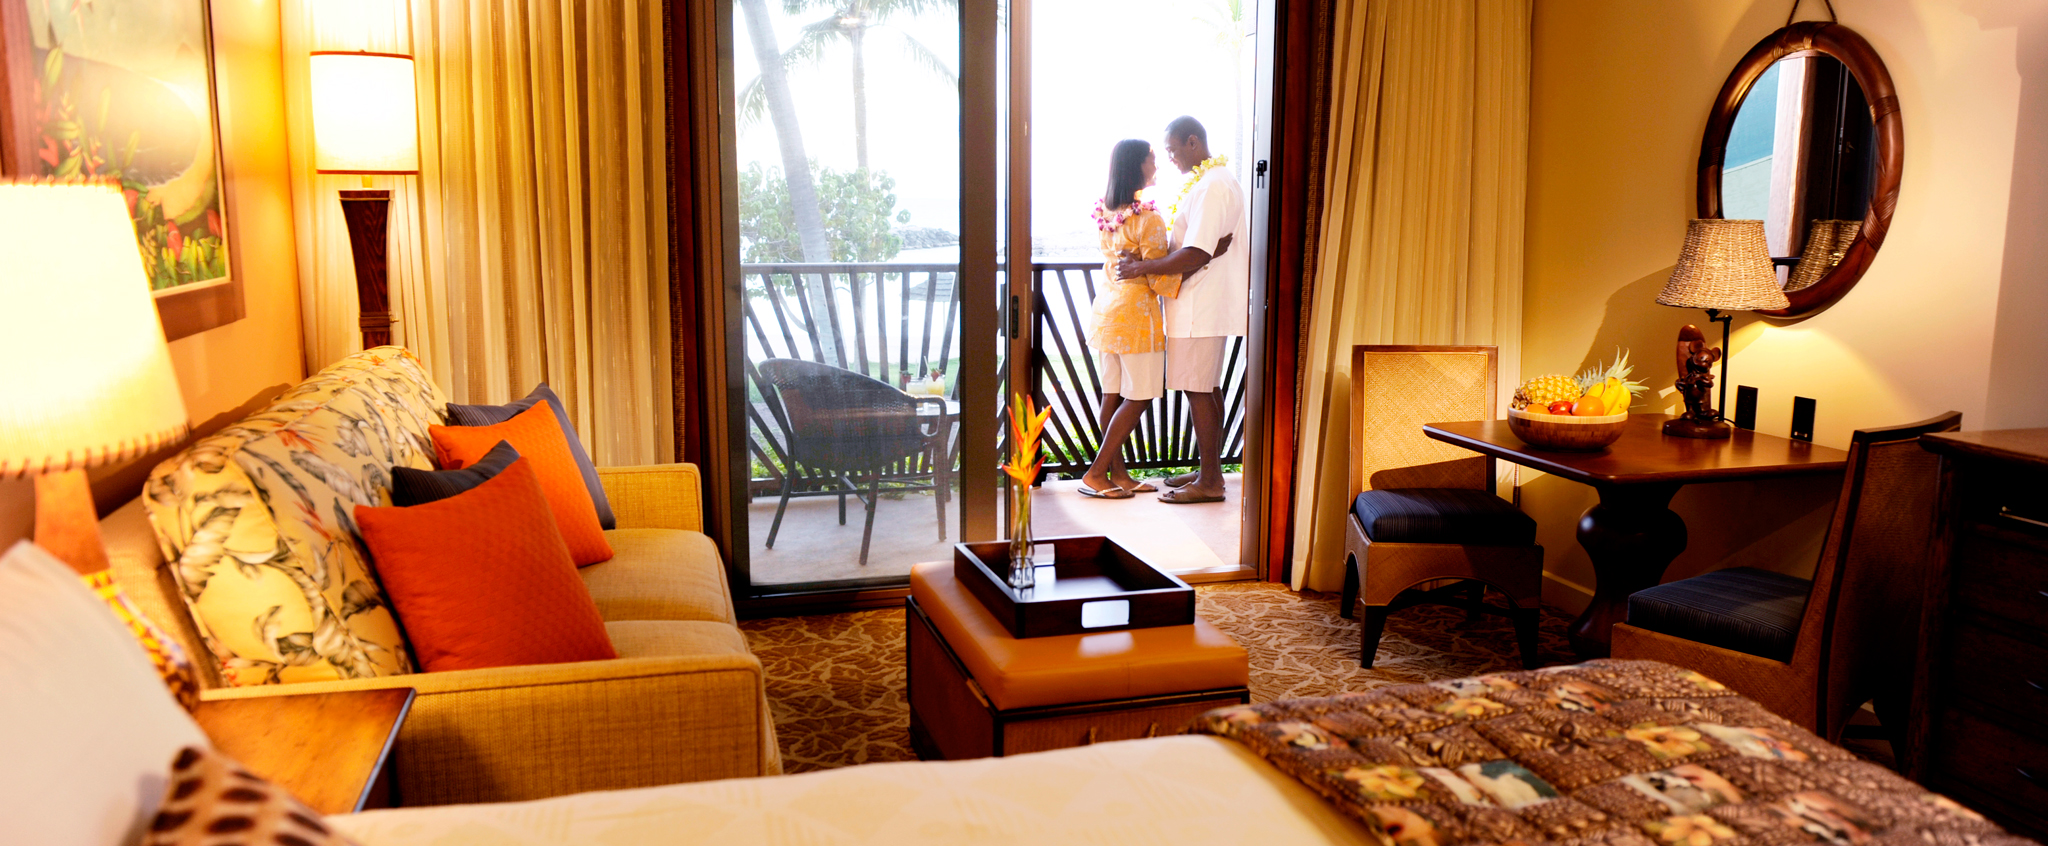 Aulani Rooms Amp Offers Aulani Hawaii Resort Amp Spa